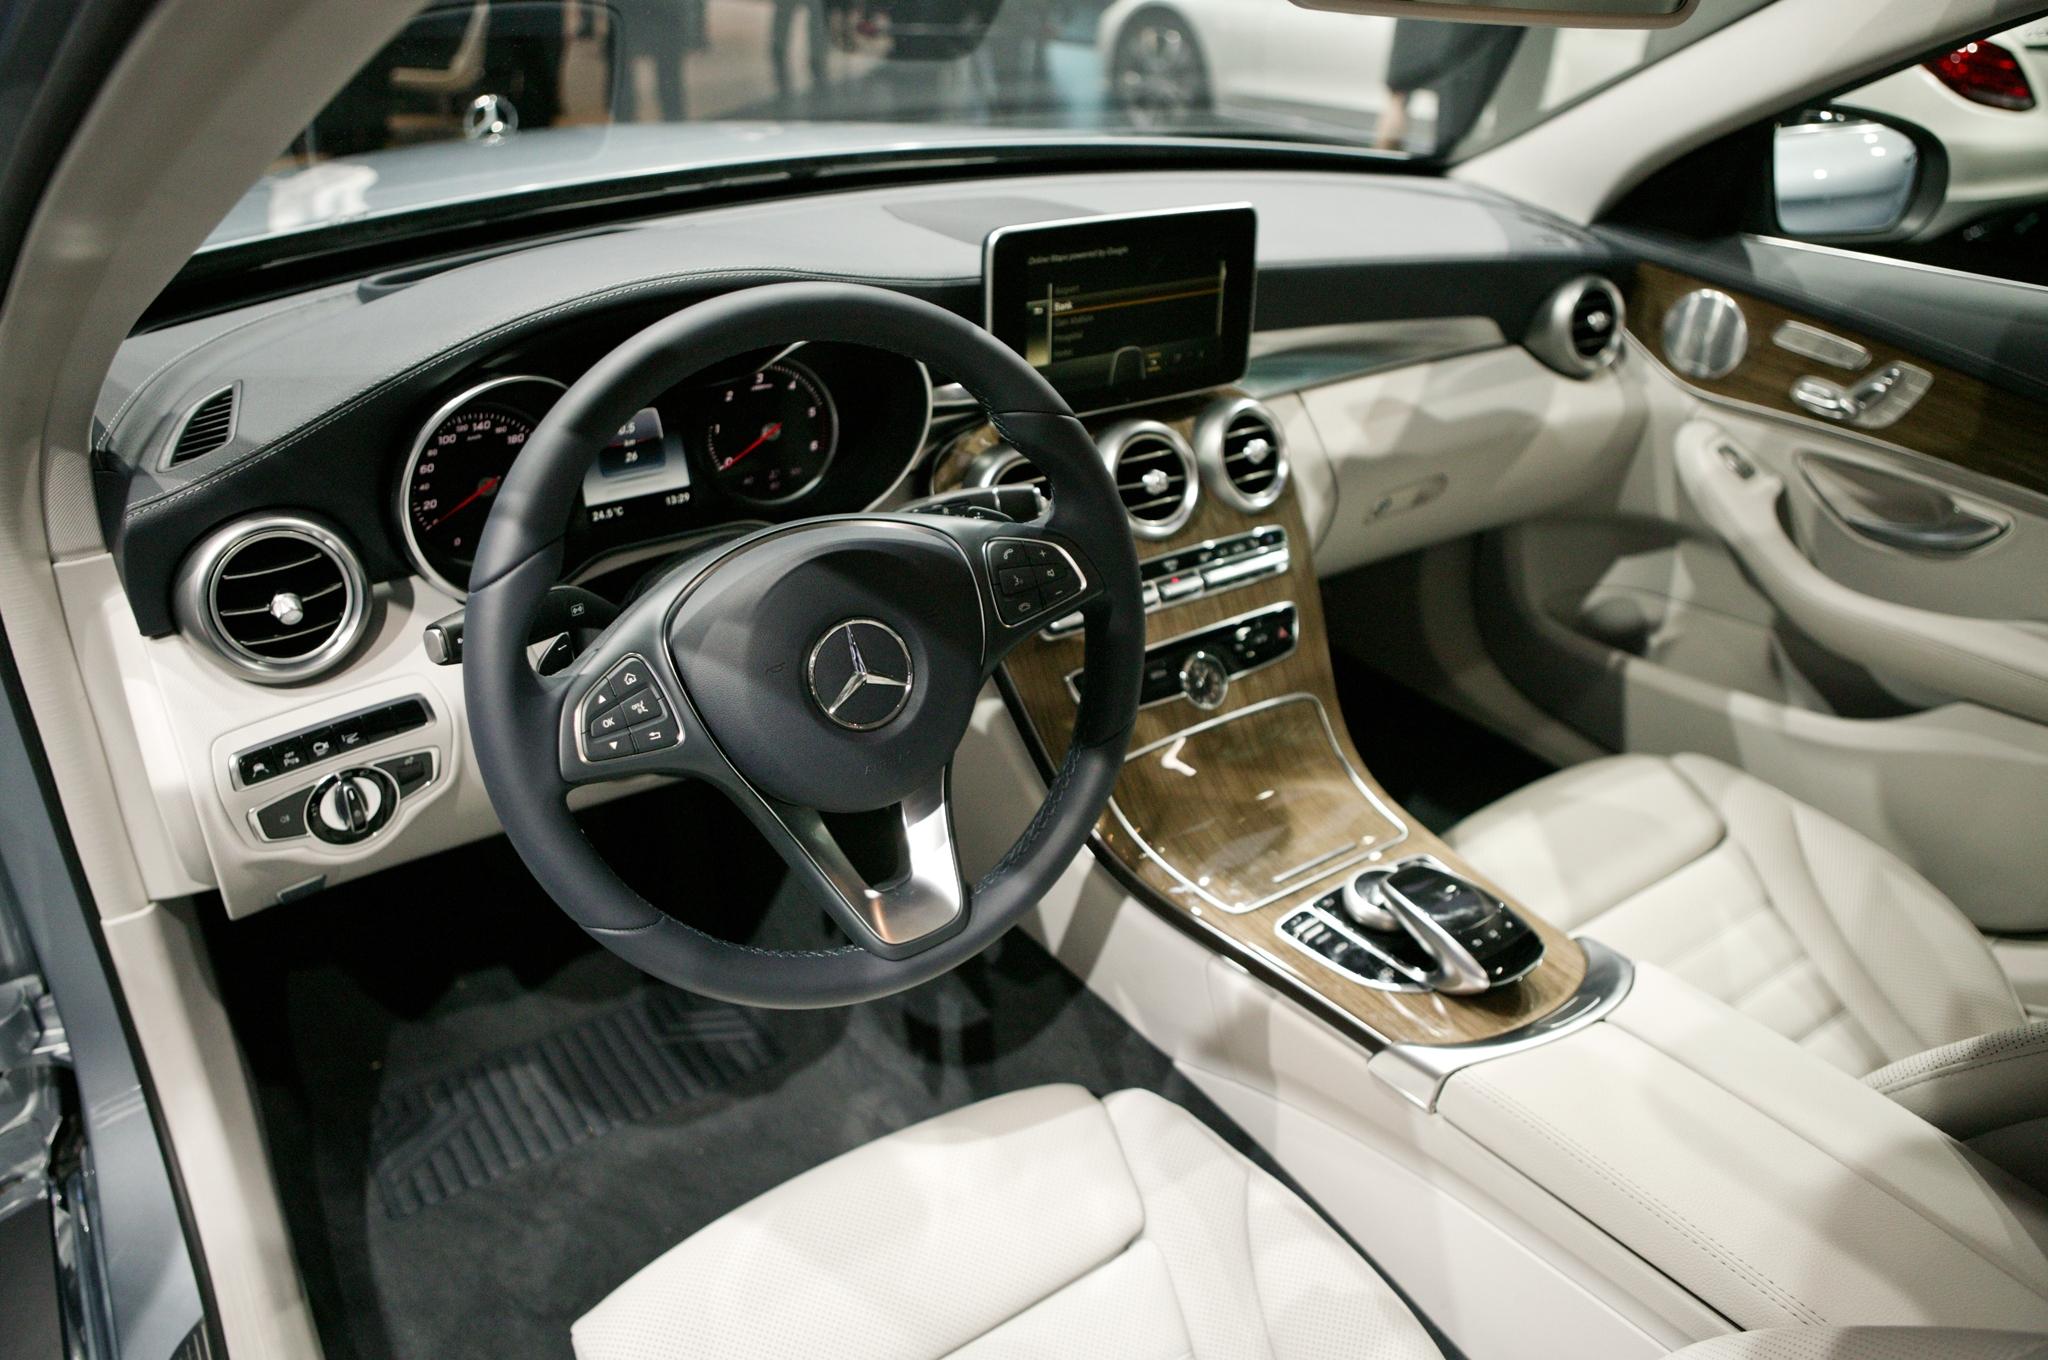 2015-Mercedes Benz-C-class-dash-view